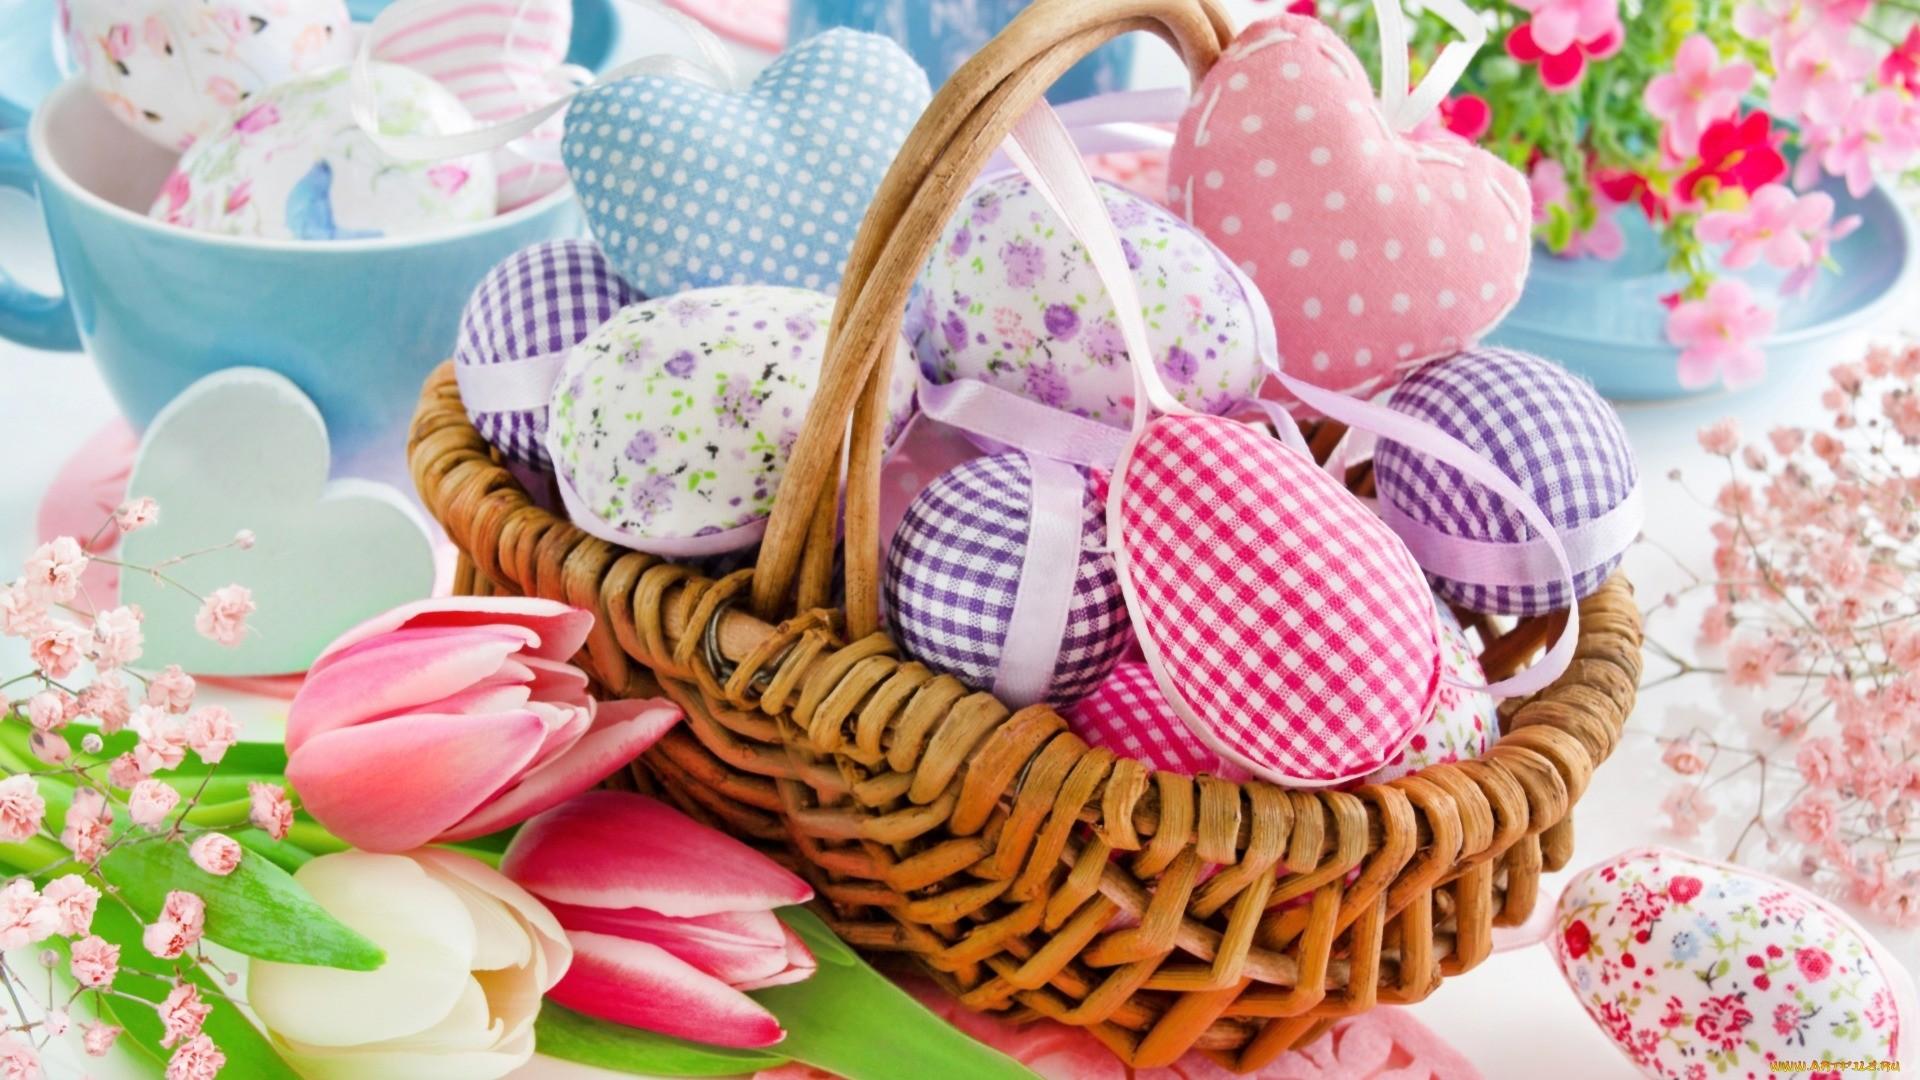 Easter Egg Decoration 1920x1080